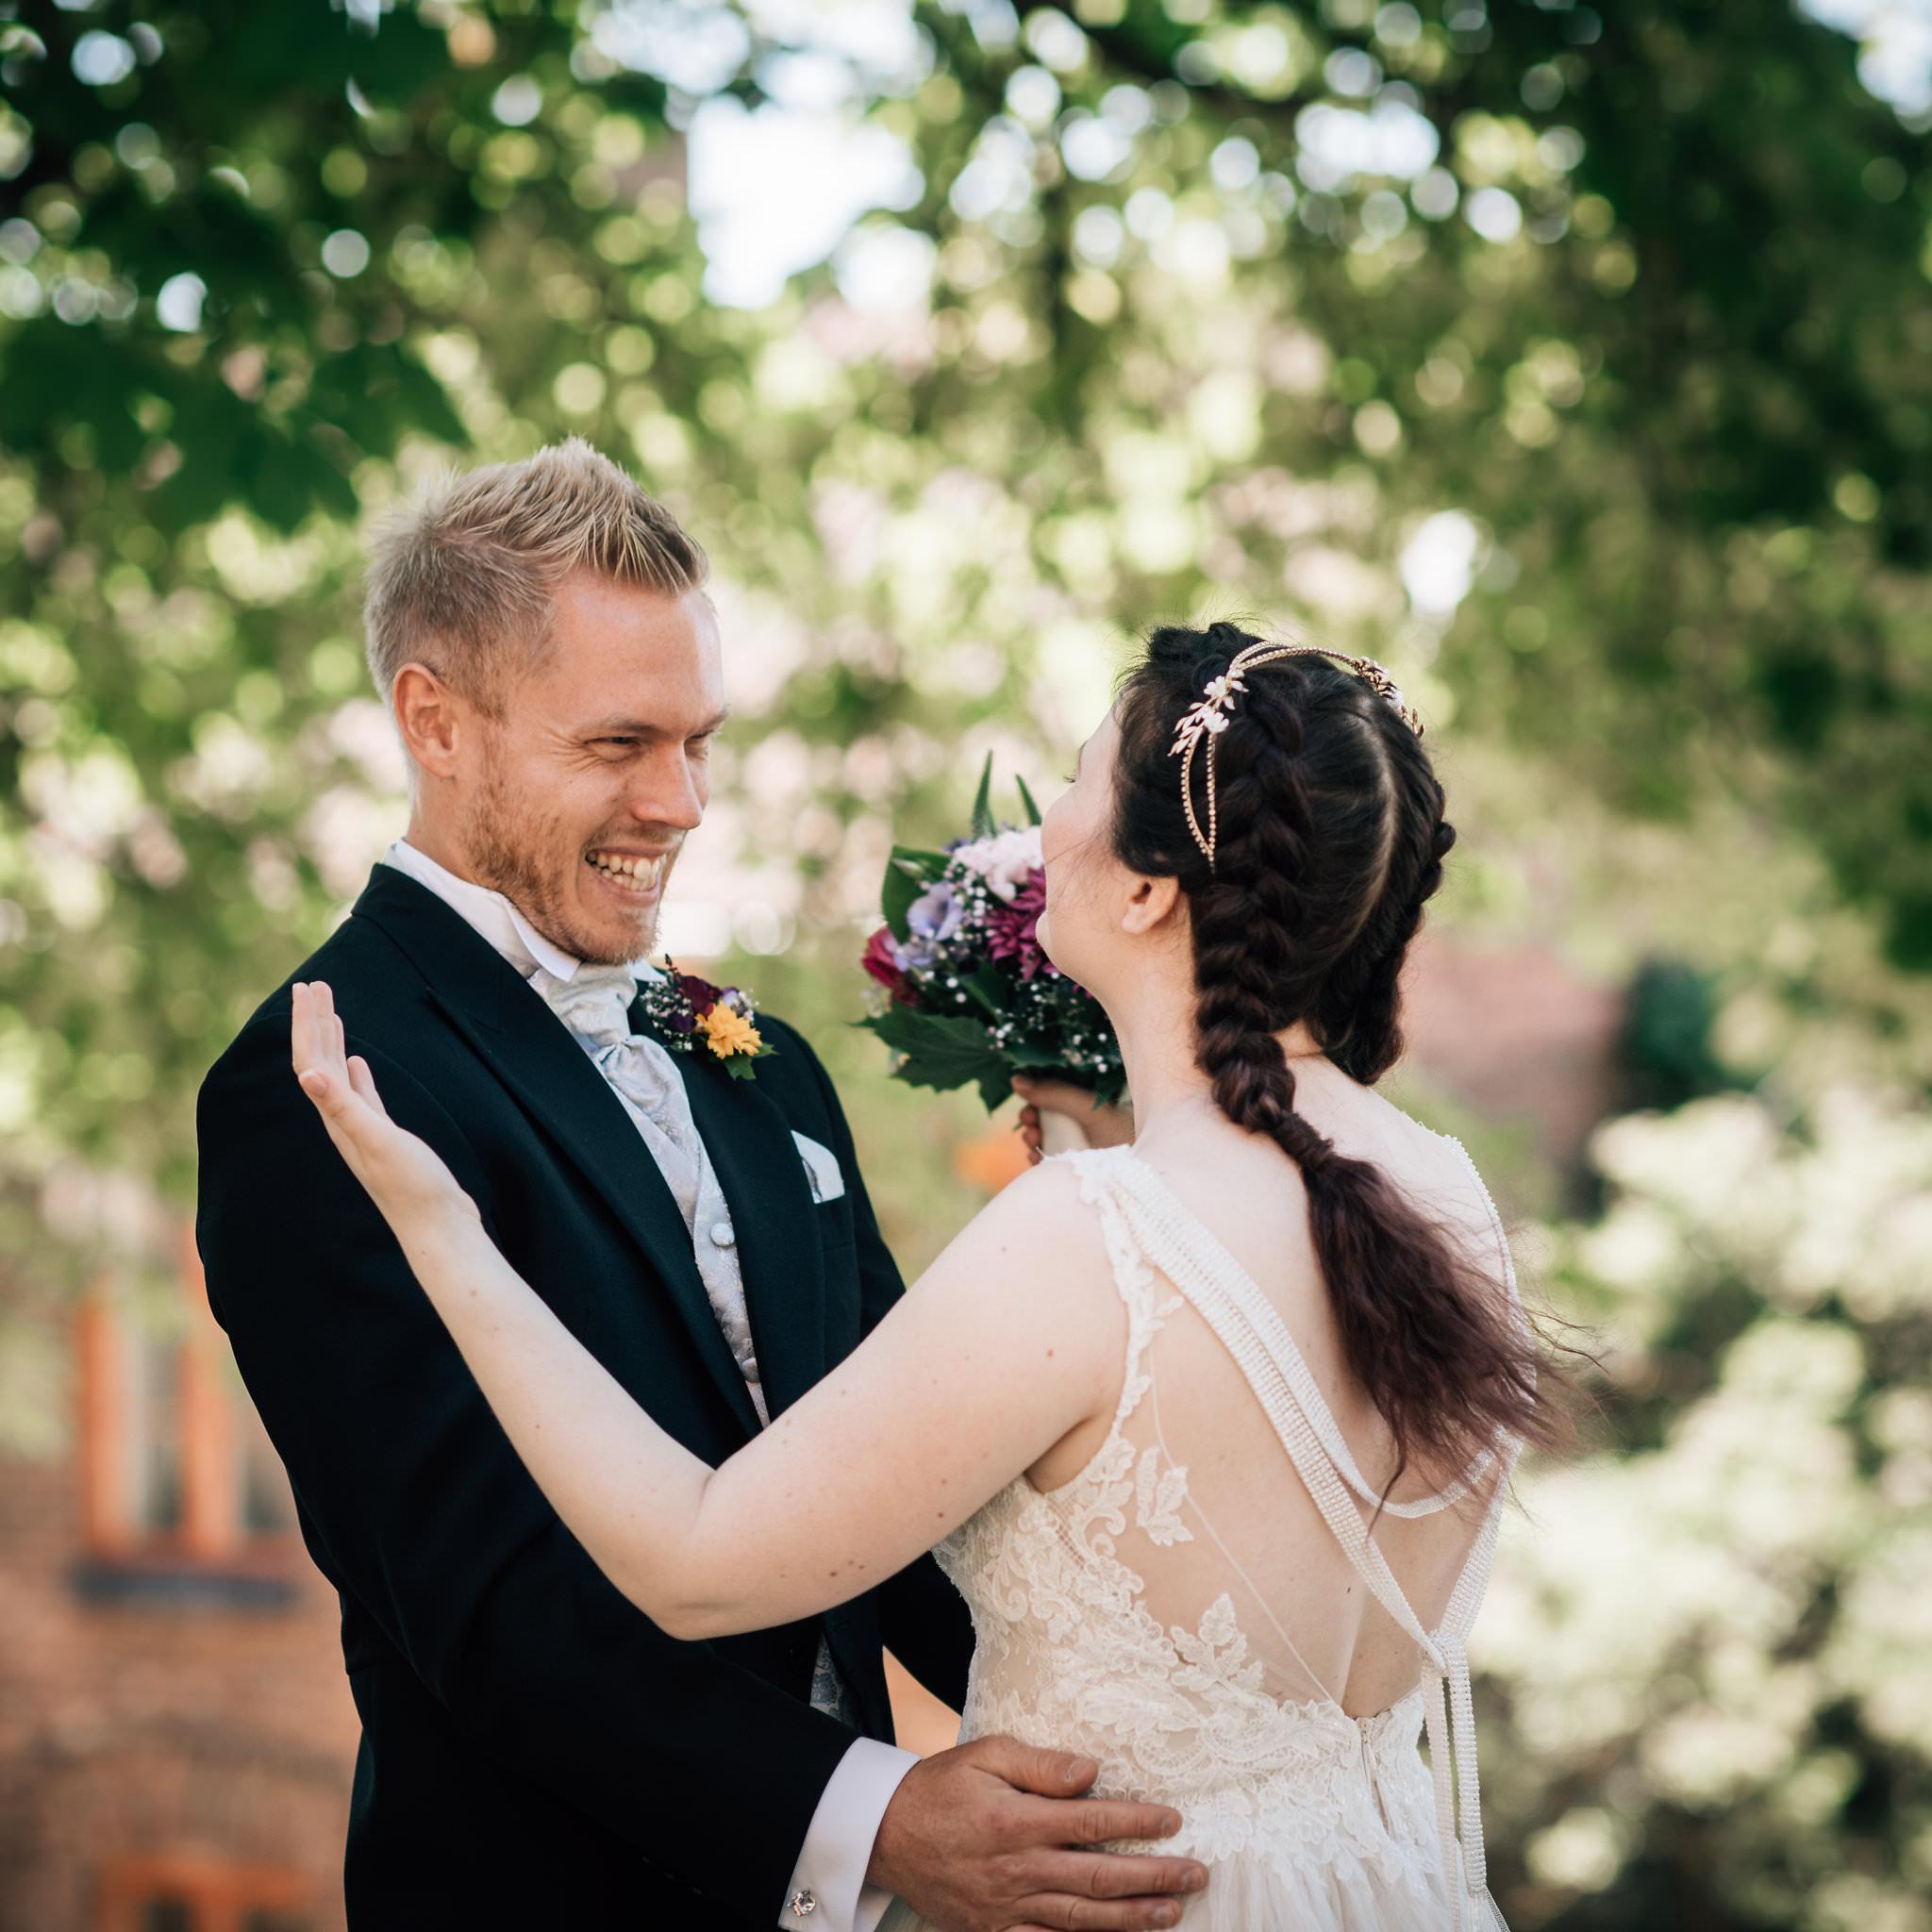 _N859777-fotograf-vestfold-bryllupsfotograf-.jpg